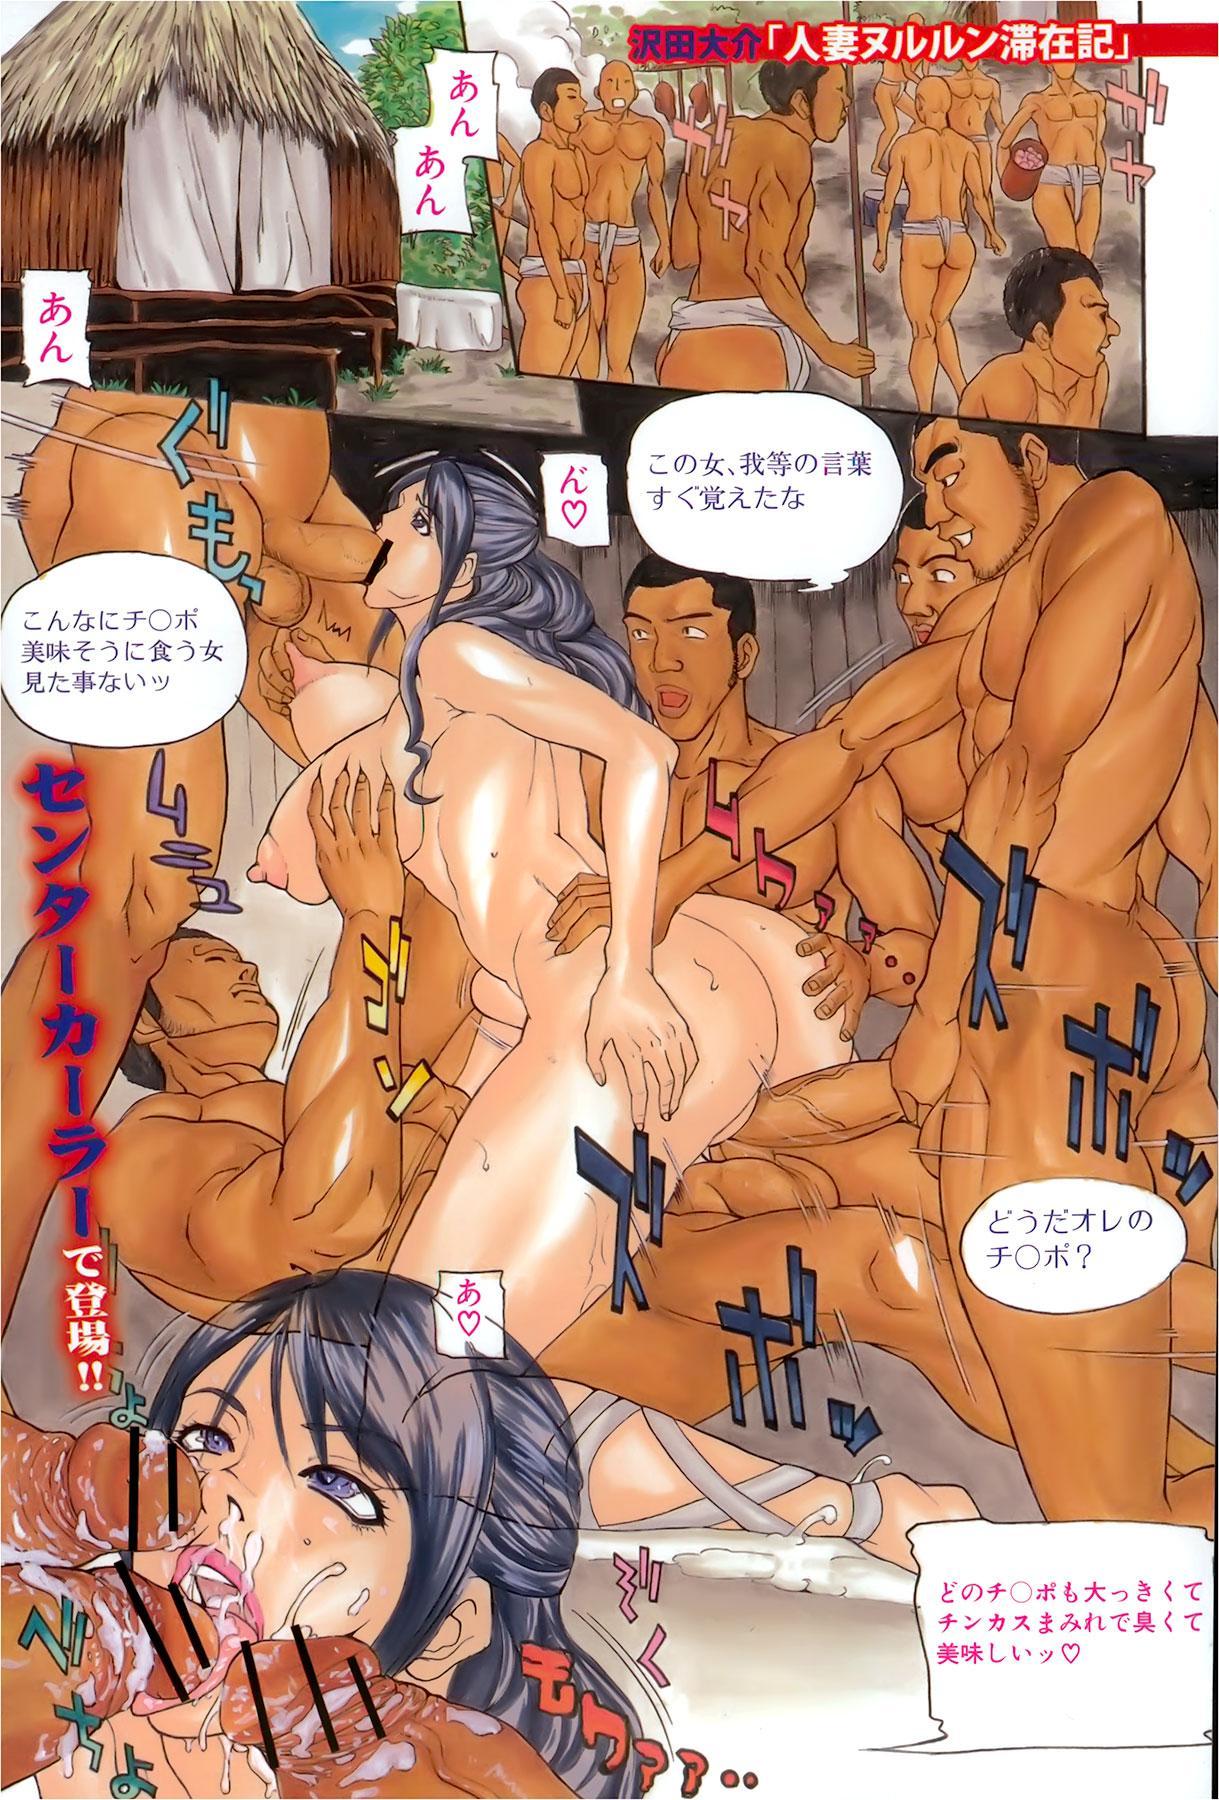 COMIC Shingeki 2013-02 166